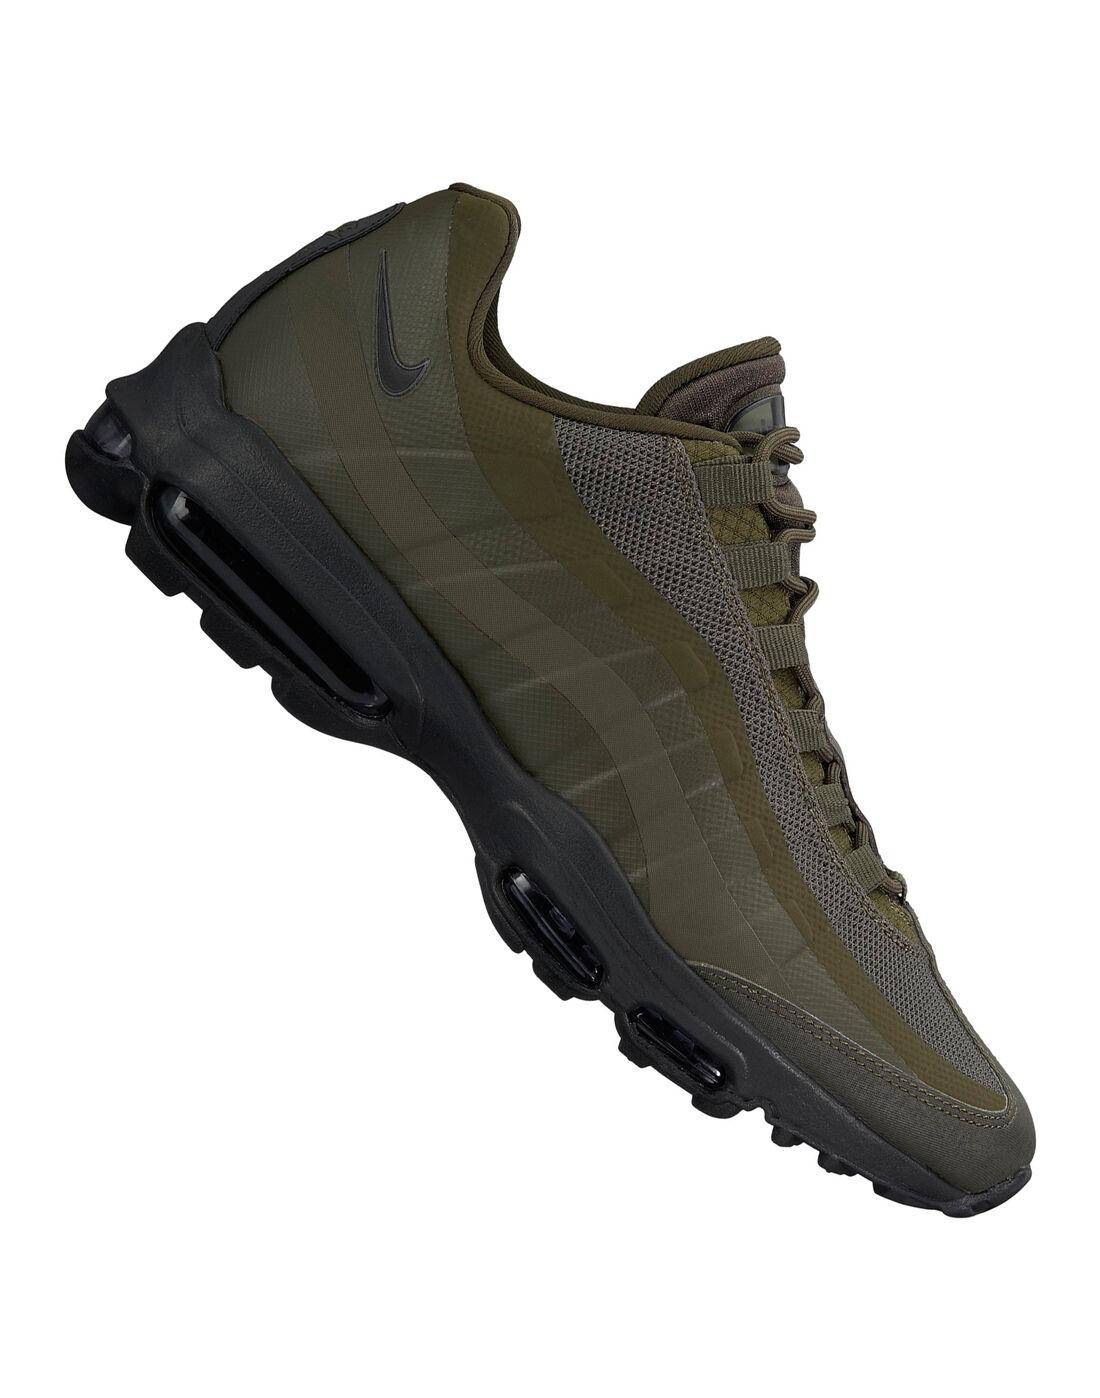 Nike Sportswear Air Max 95 Ultra Essential Khaki